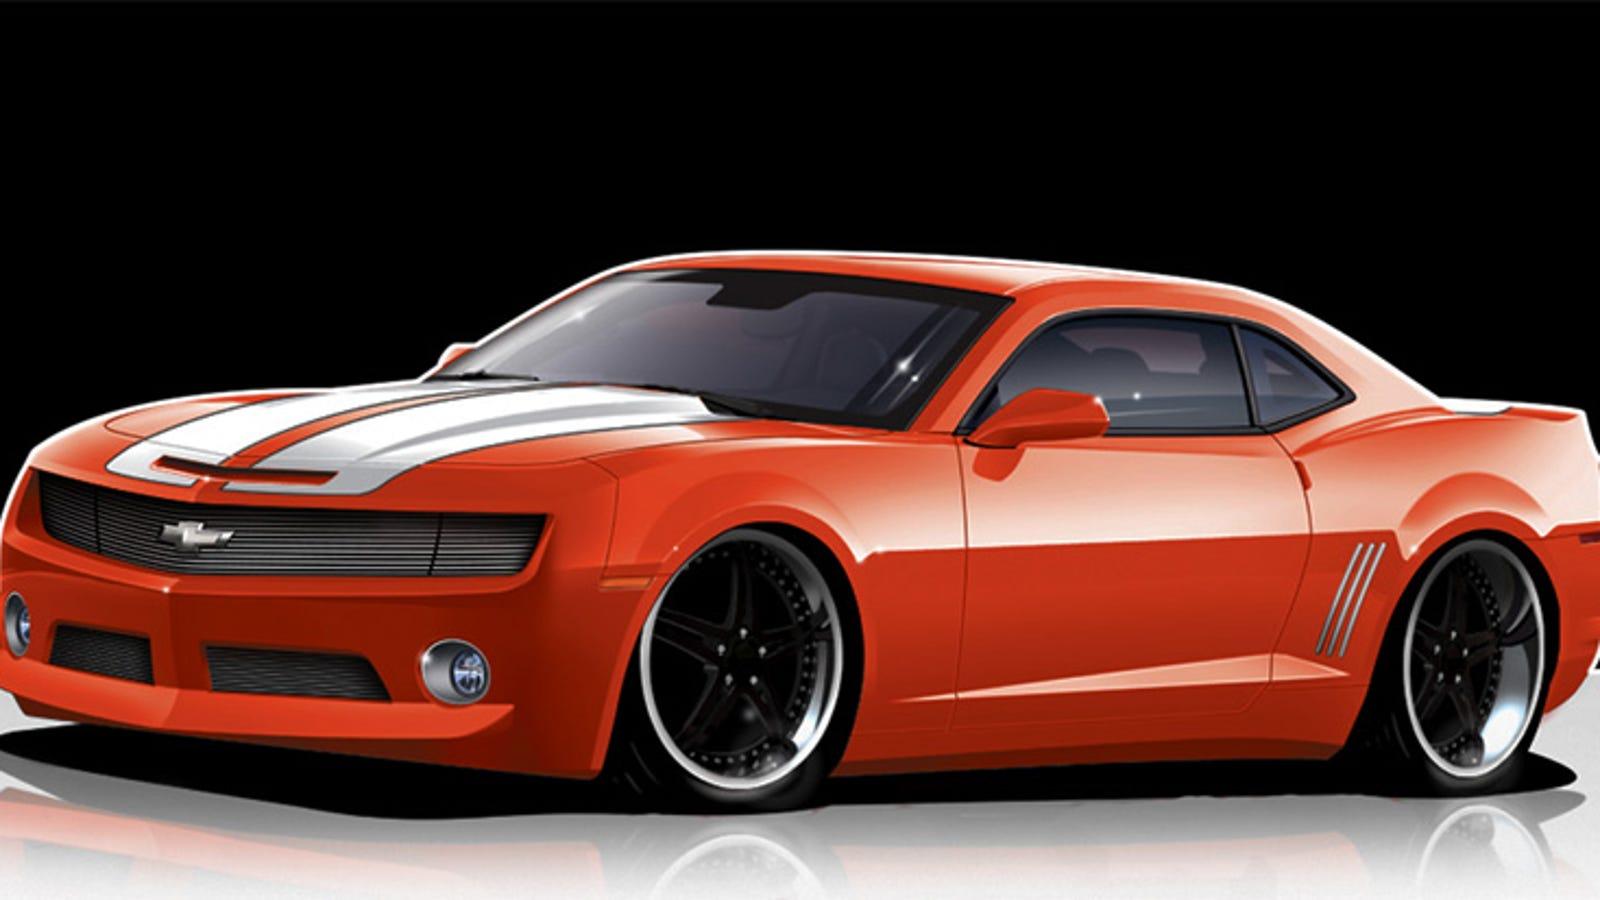 Fesler Moss Builds A Corvette Zr1 Powered Camaro Ss